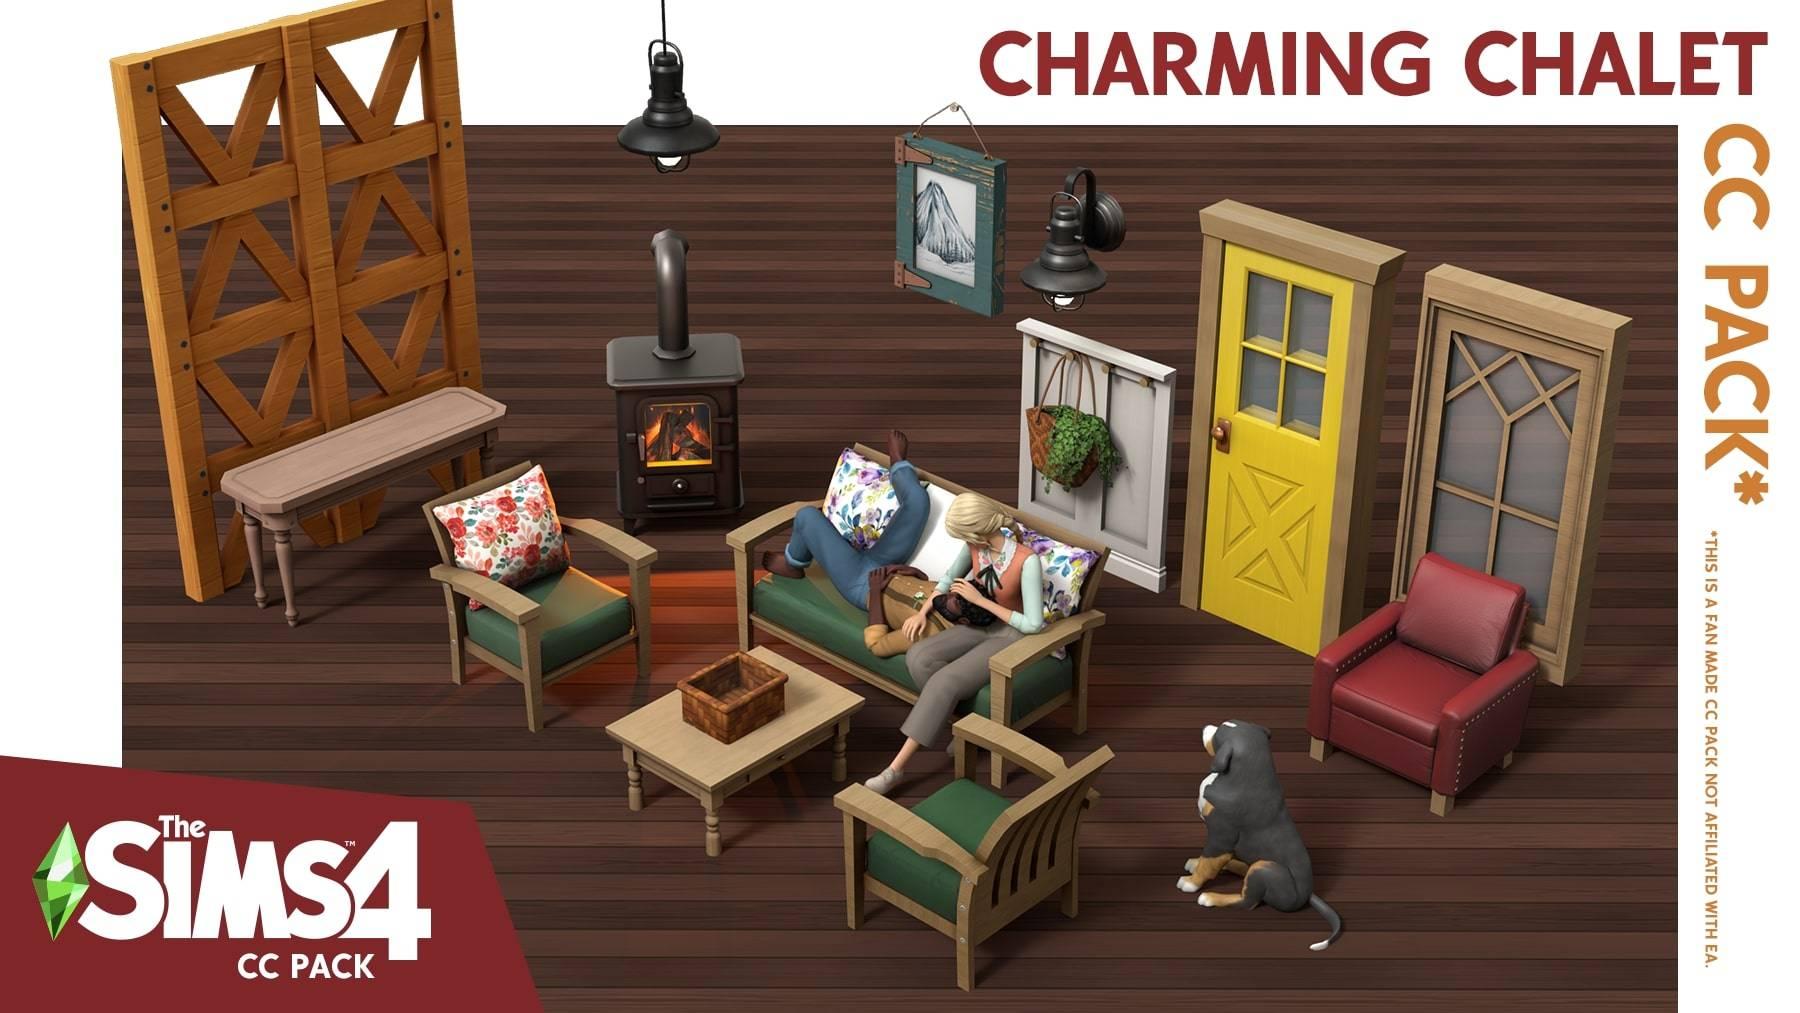 Набор для сельского домика - Charming Chalet CC Pack